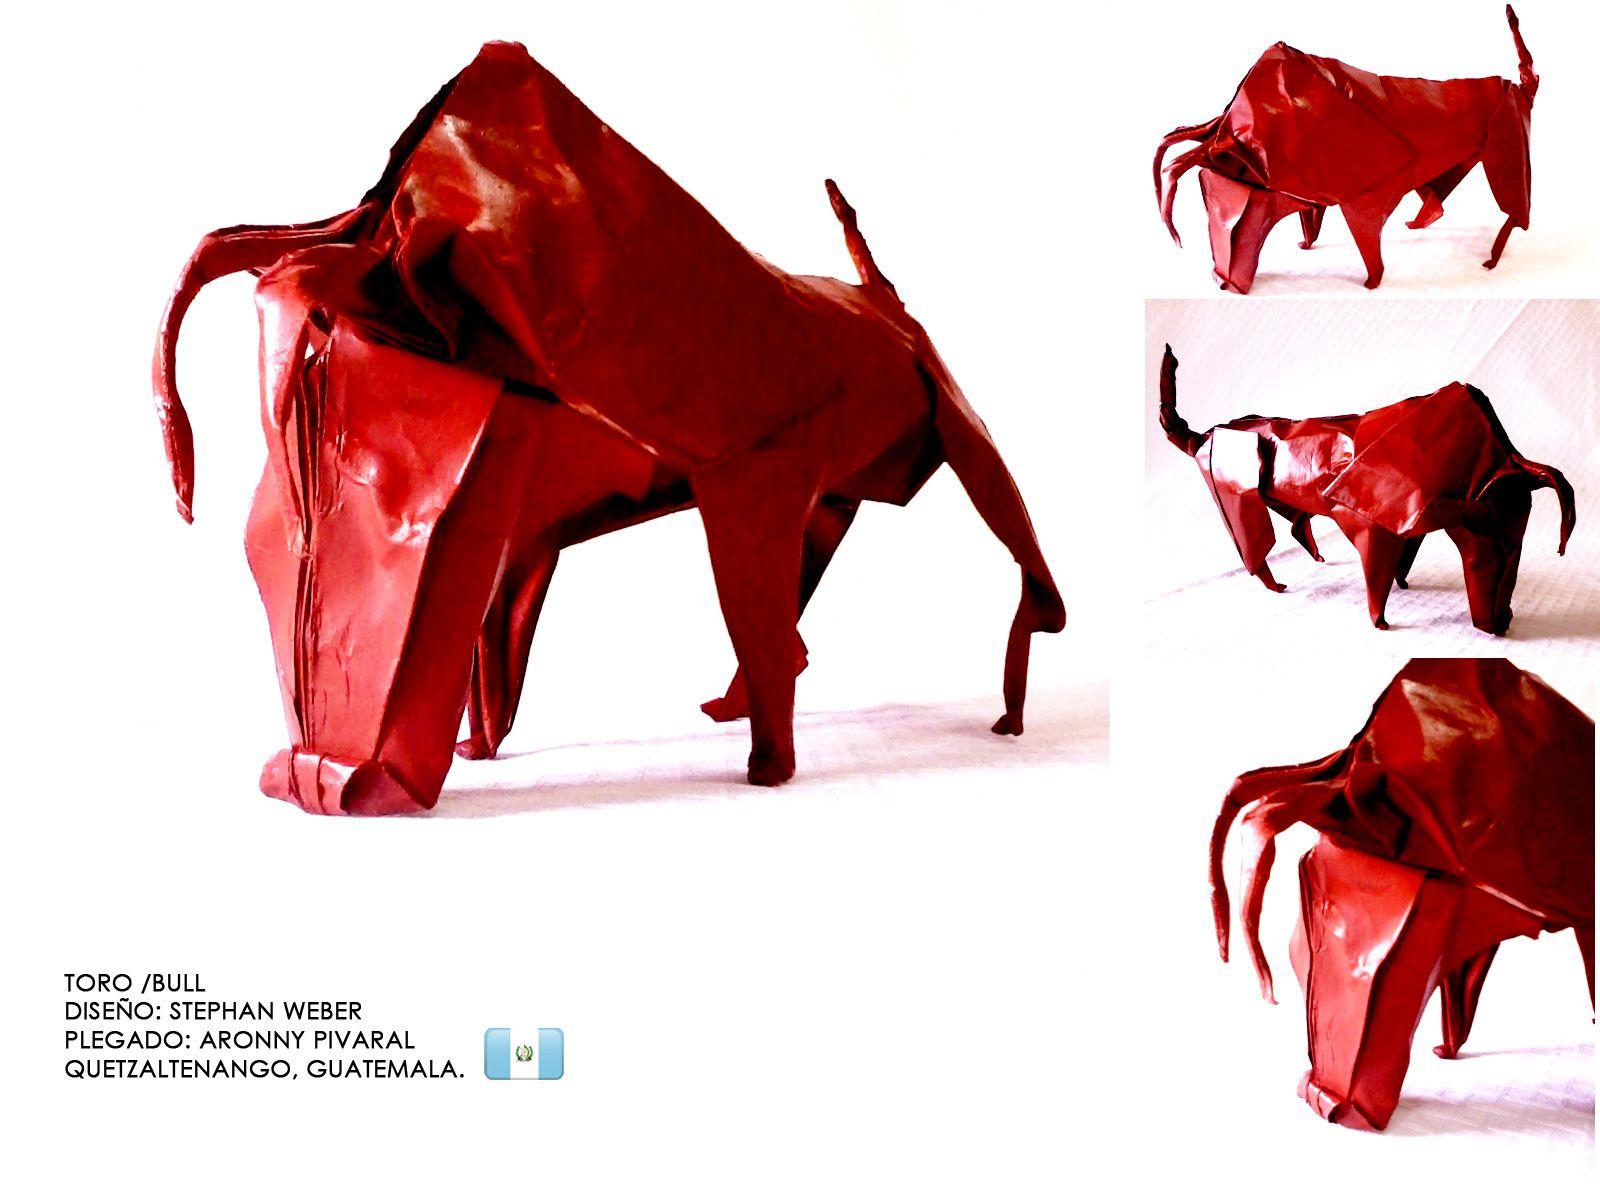 origami toro    bull 2 dise u00f1o   stephan weber plegado   aronnypivaral  quetzaltenango   xela